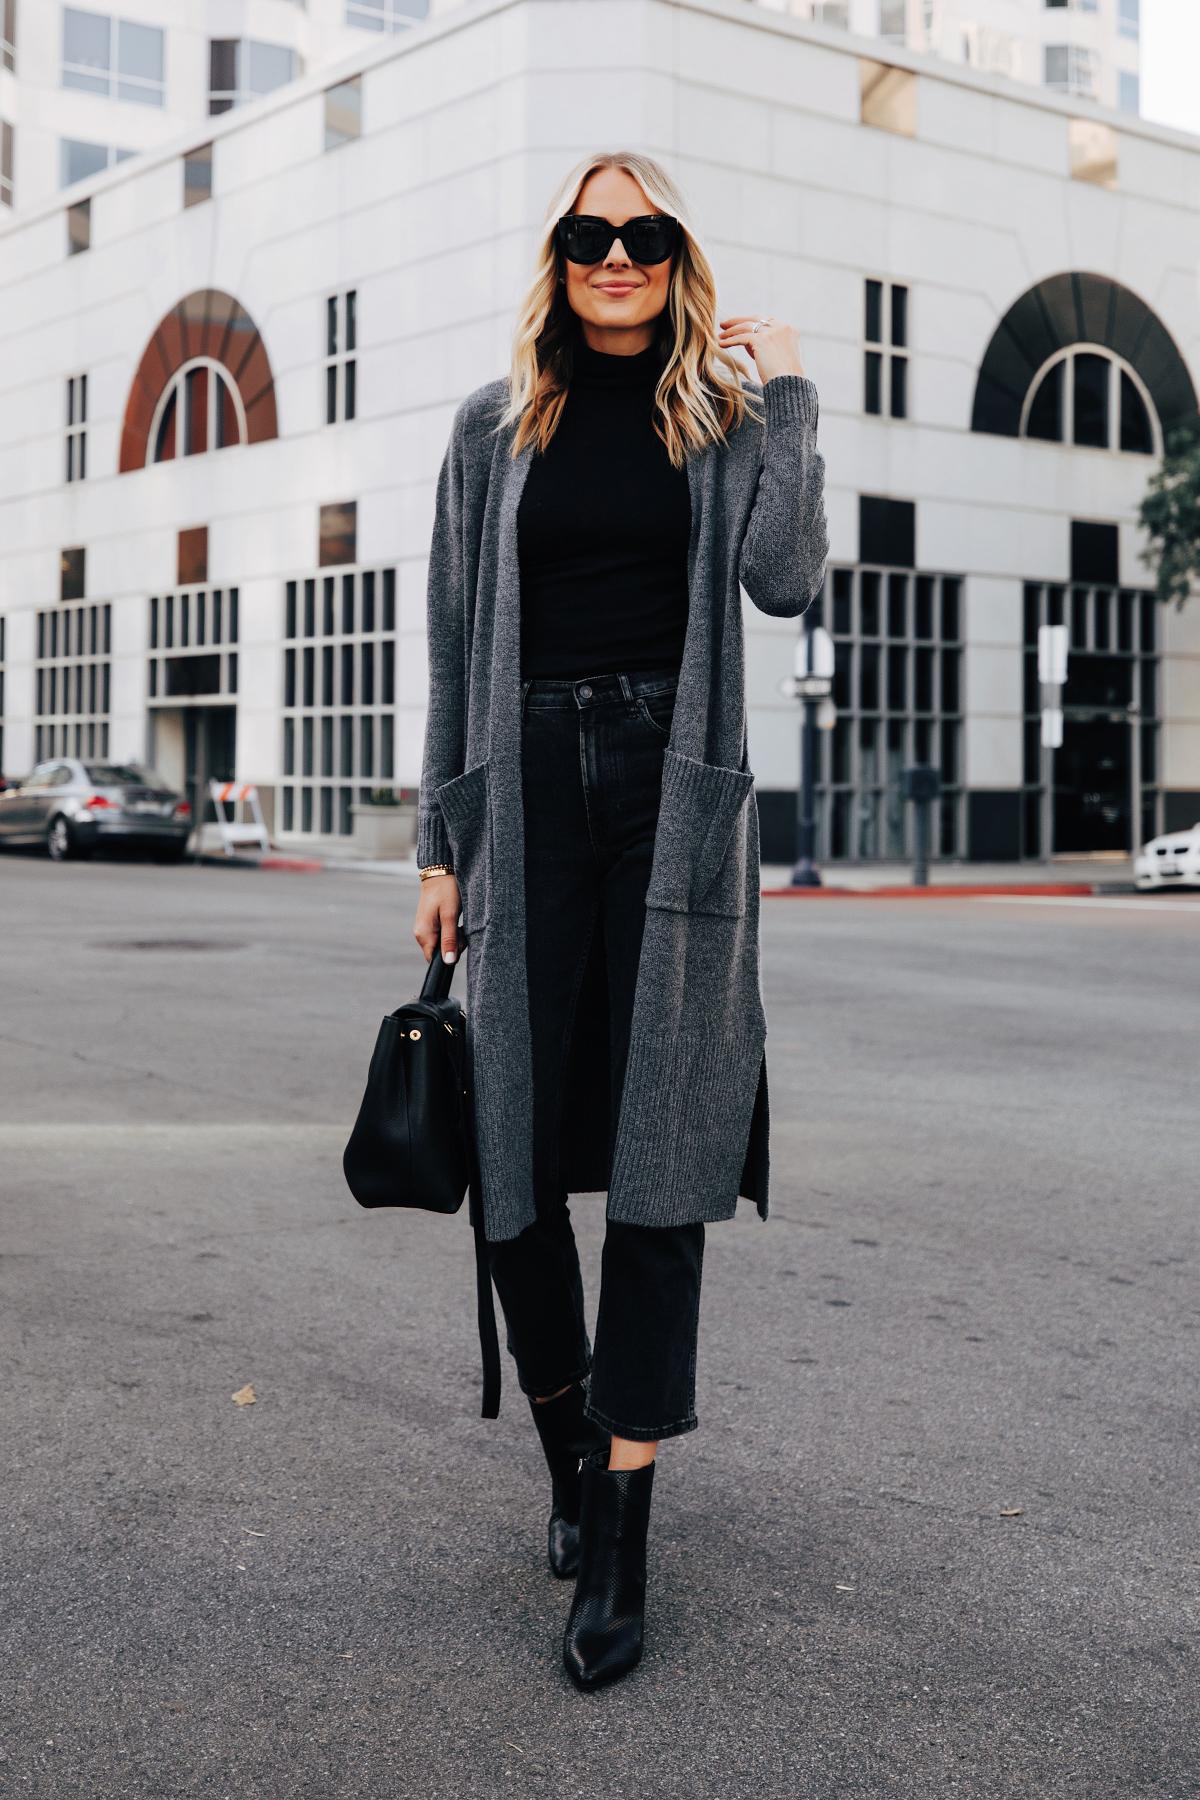 Fashion Jackson Wearing Walmart Scoop Long Grey Cardigan Black Top Black Jeans Black Snakeskin Booties